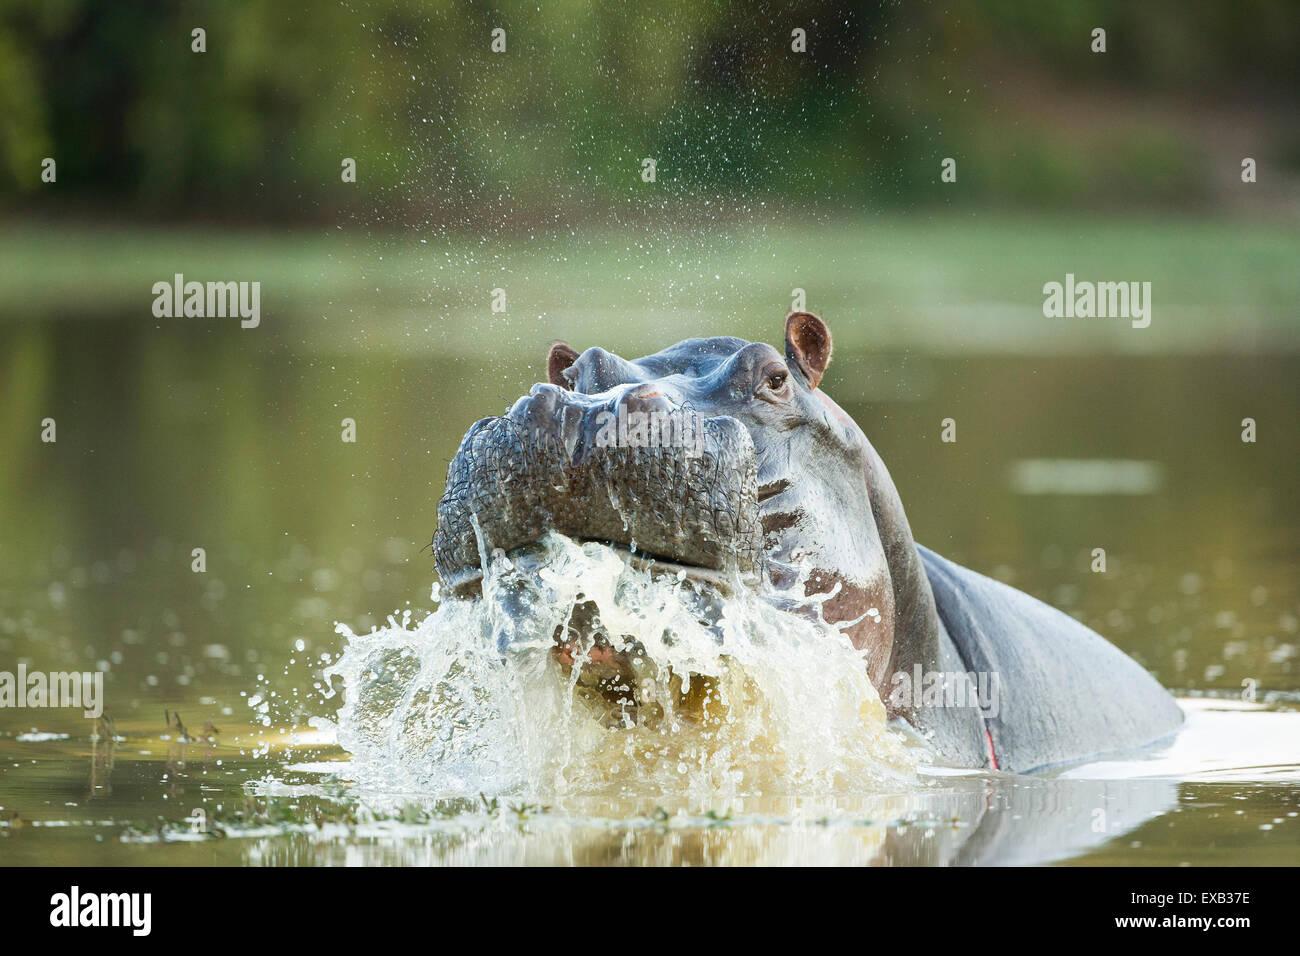 Male Hippopotamus displaying aggressive territorial behaviour spraying water - Stock Image